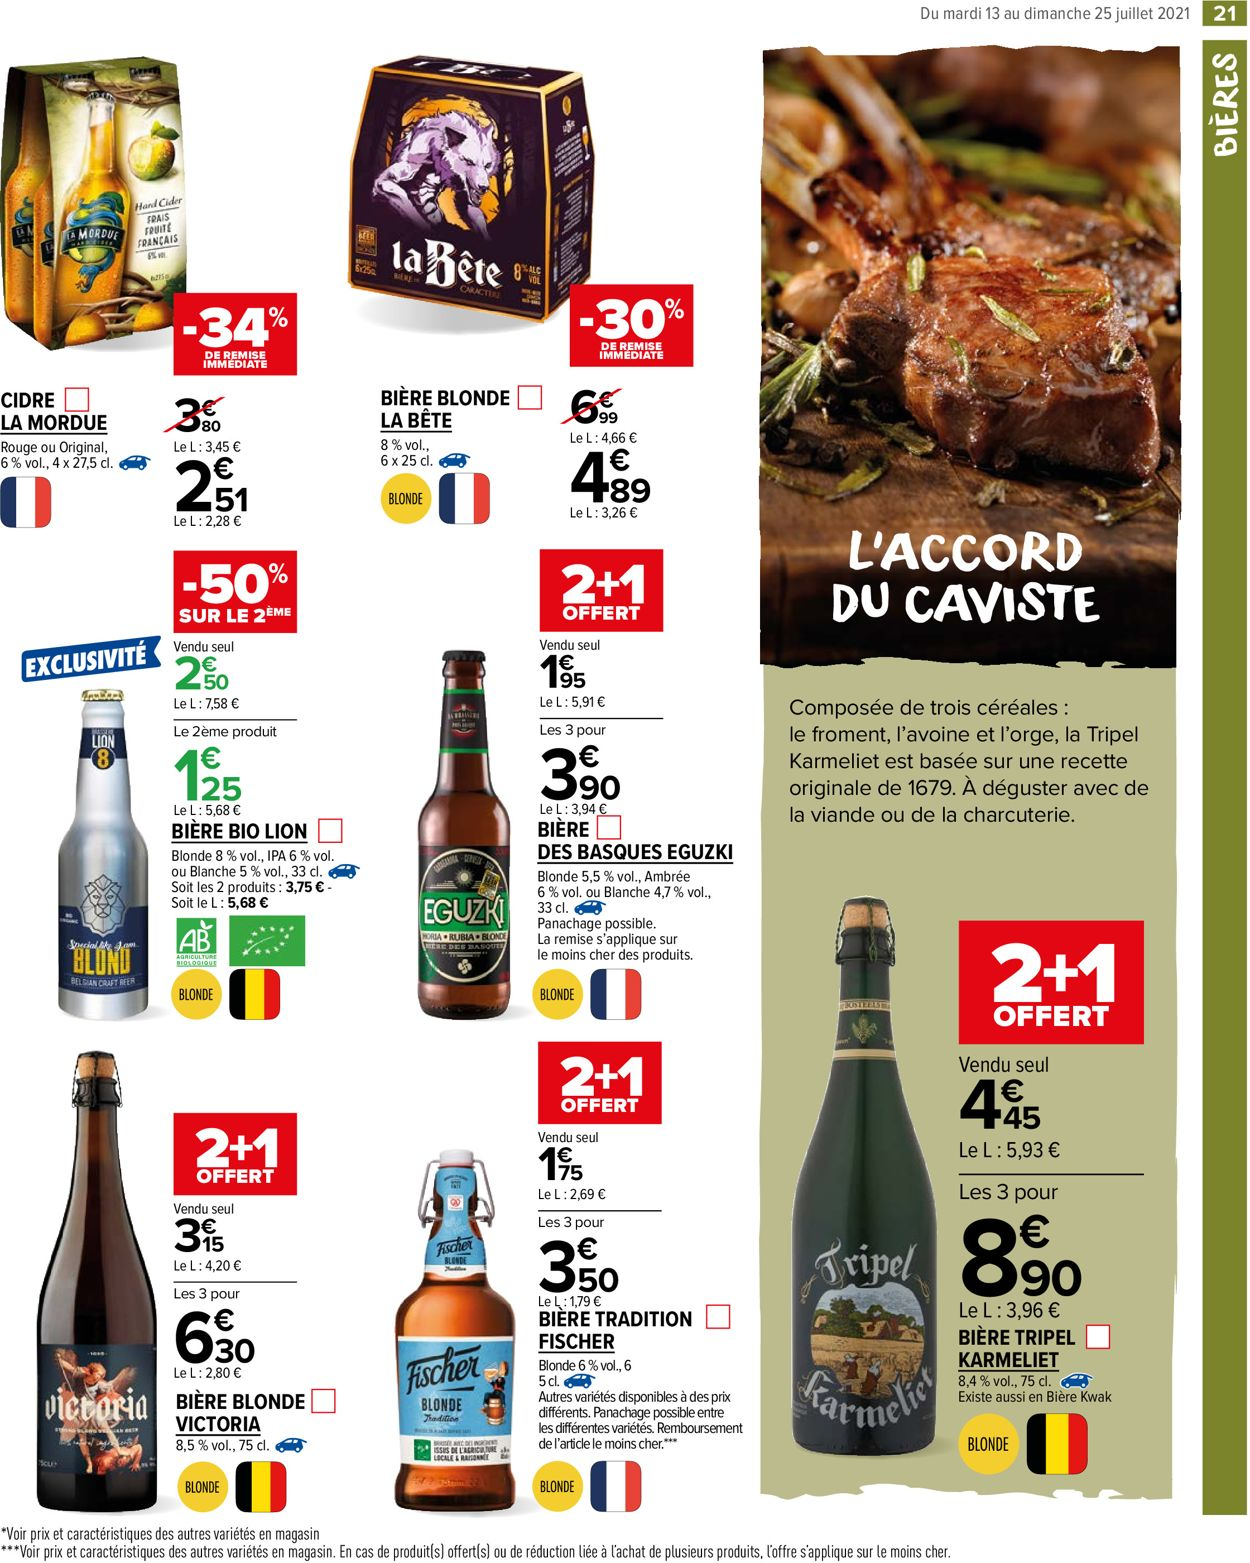 Carrefour Catalogue - 13.07-25.07.2021 (Page 21)